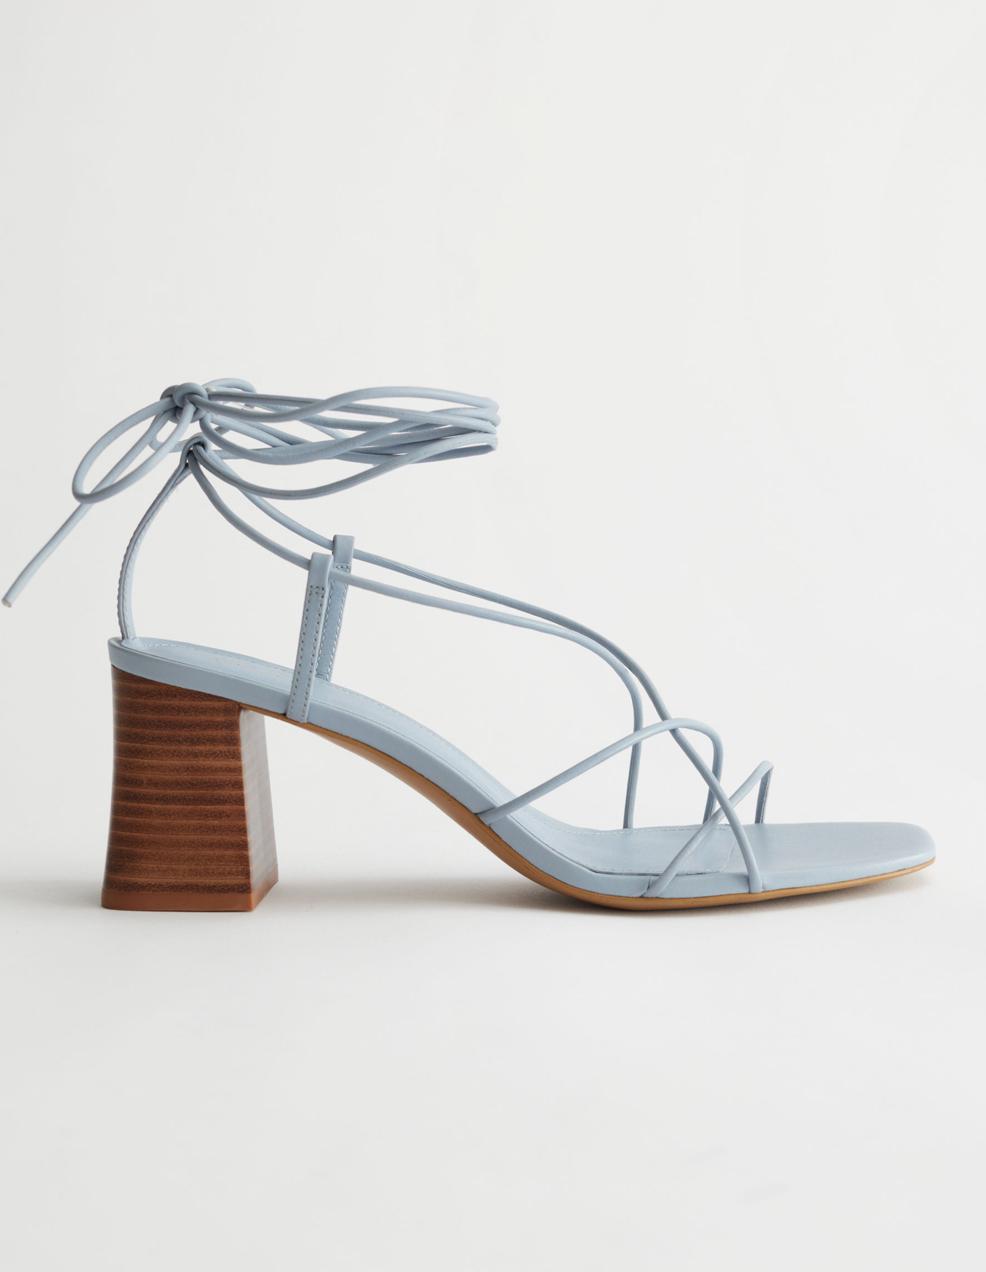 sandals for summer 2021